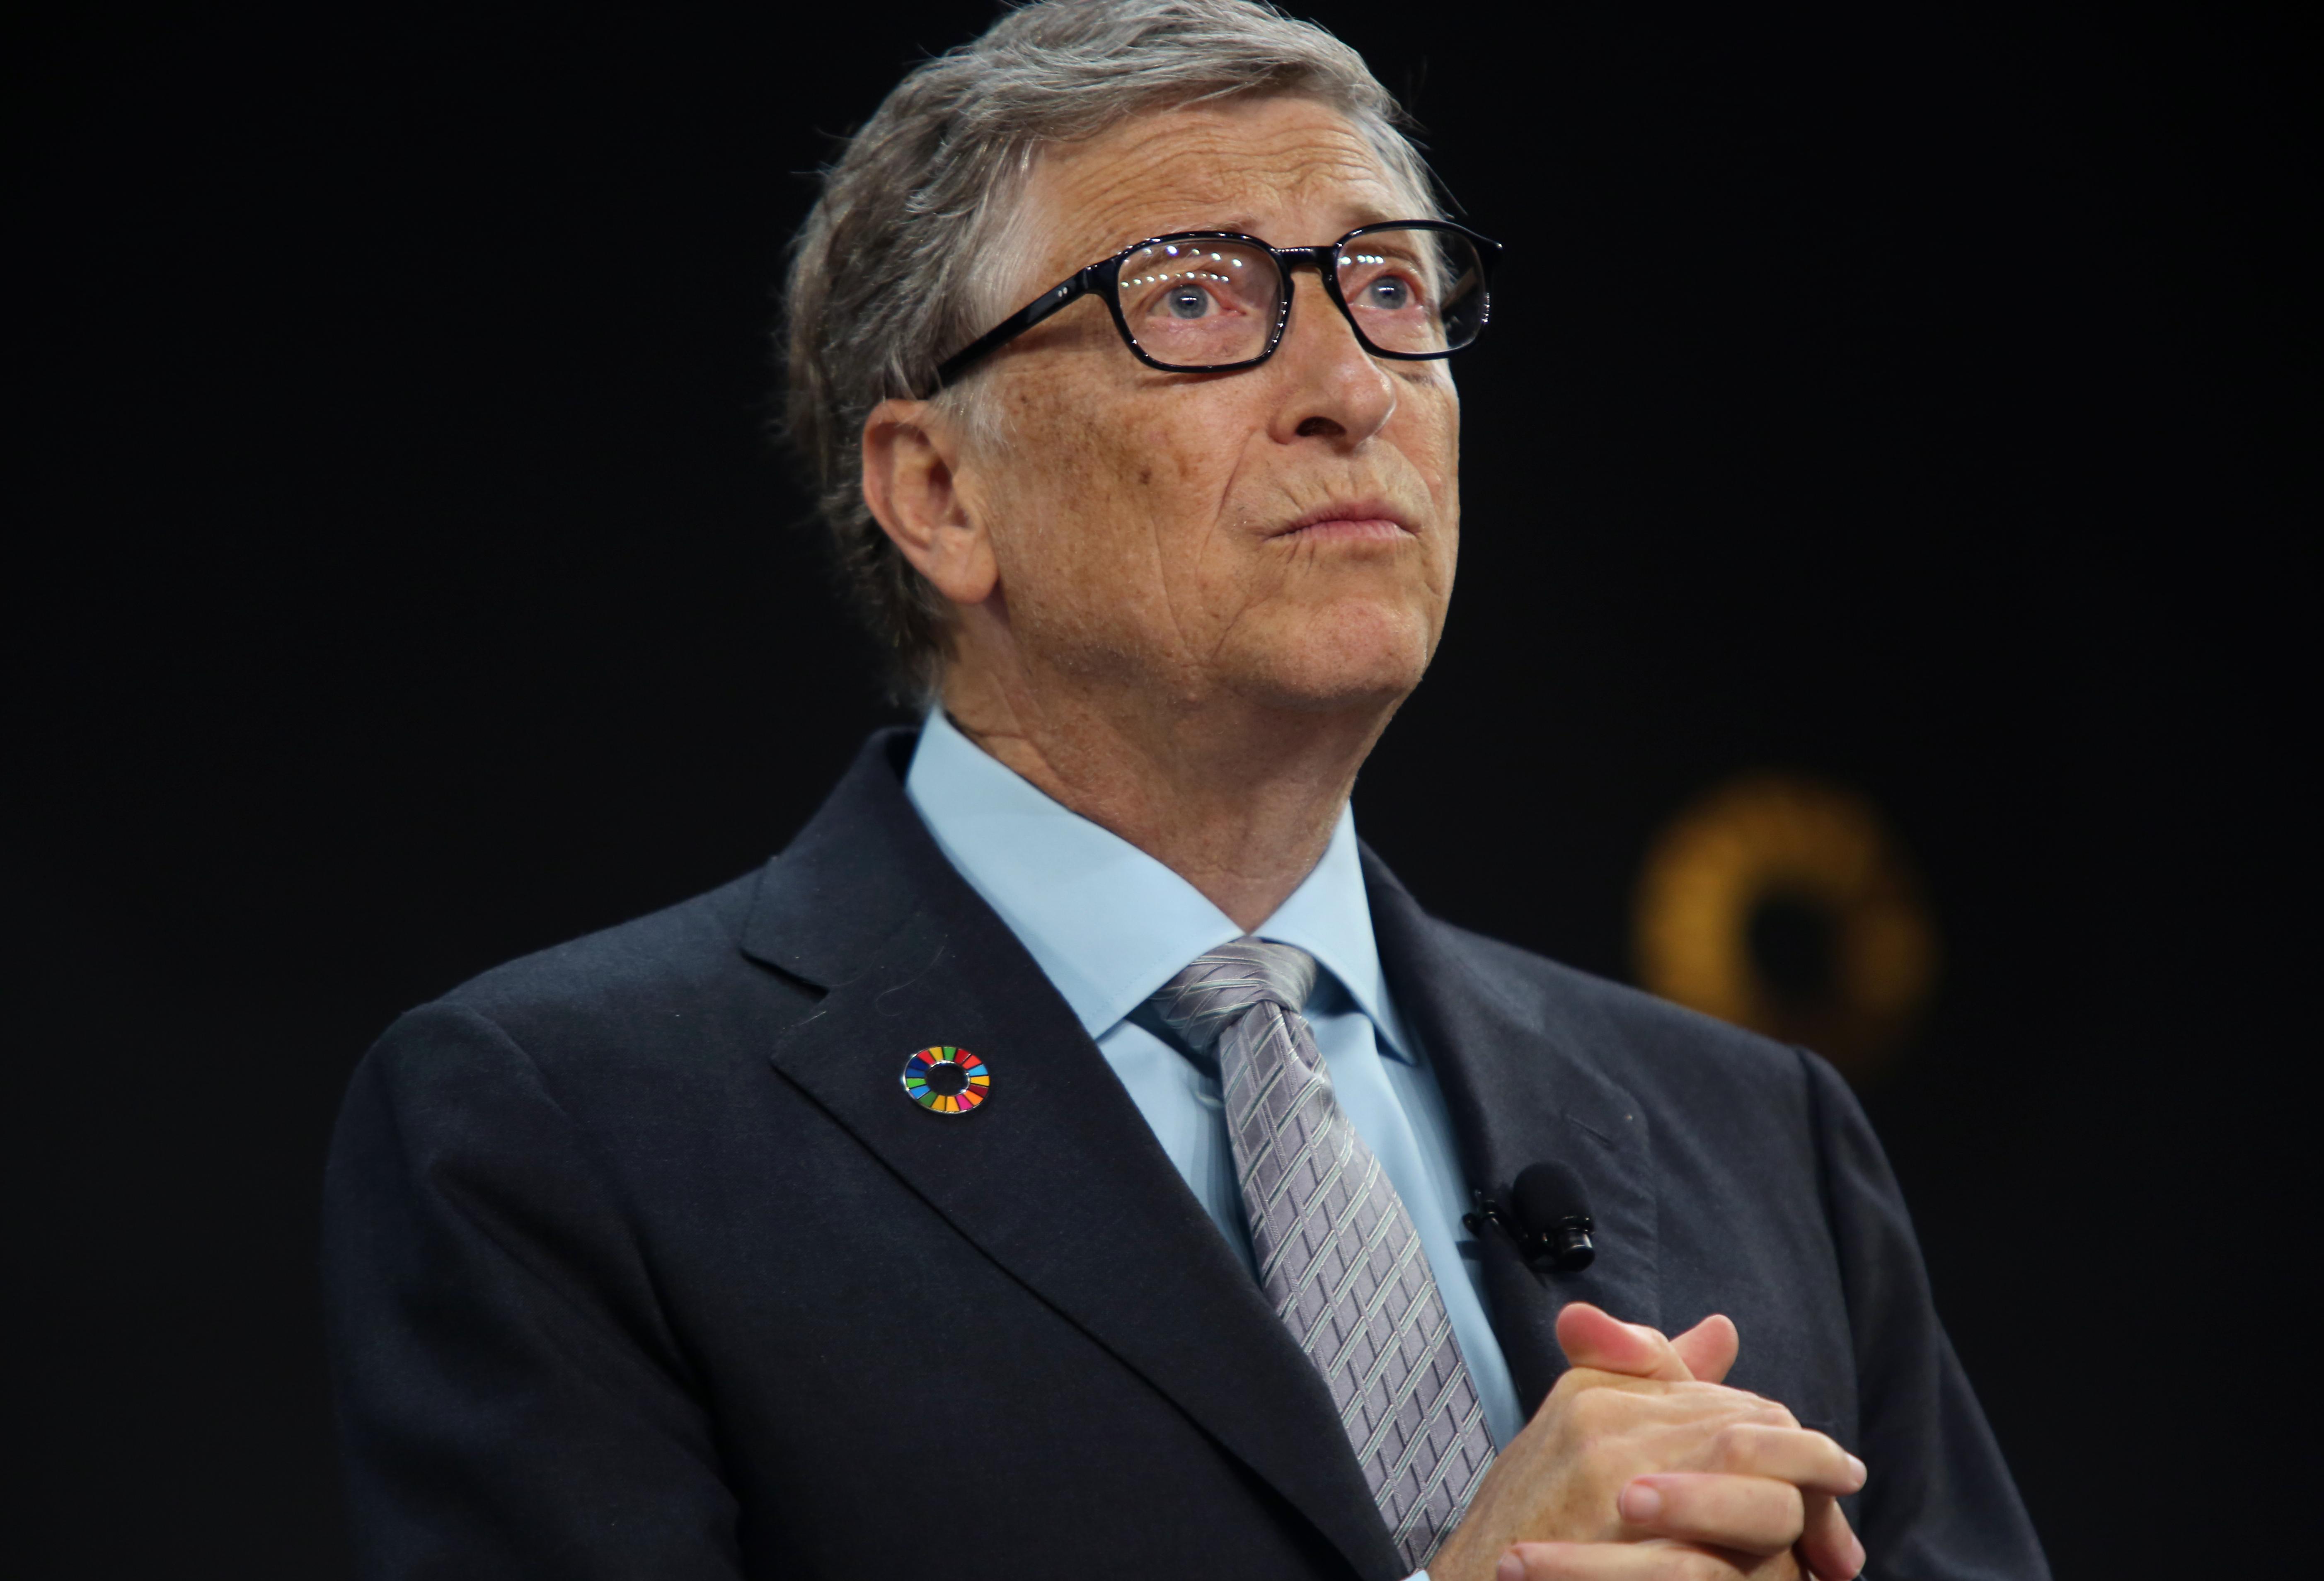 Bill Gates looks concerned.